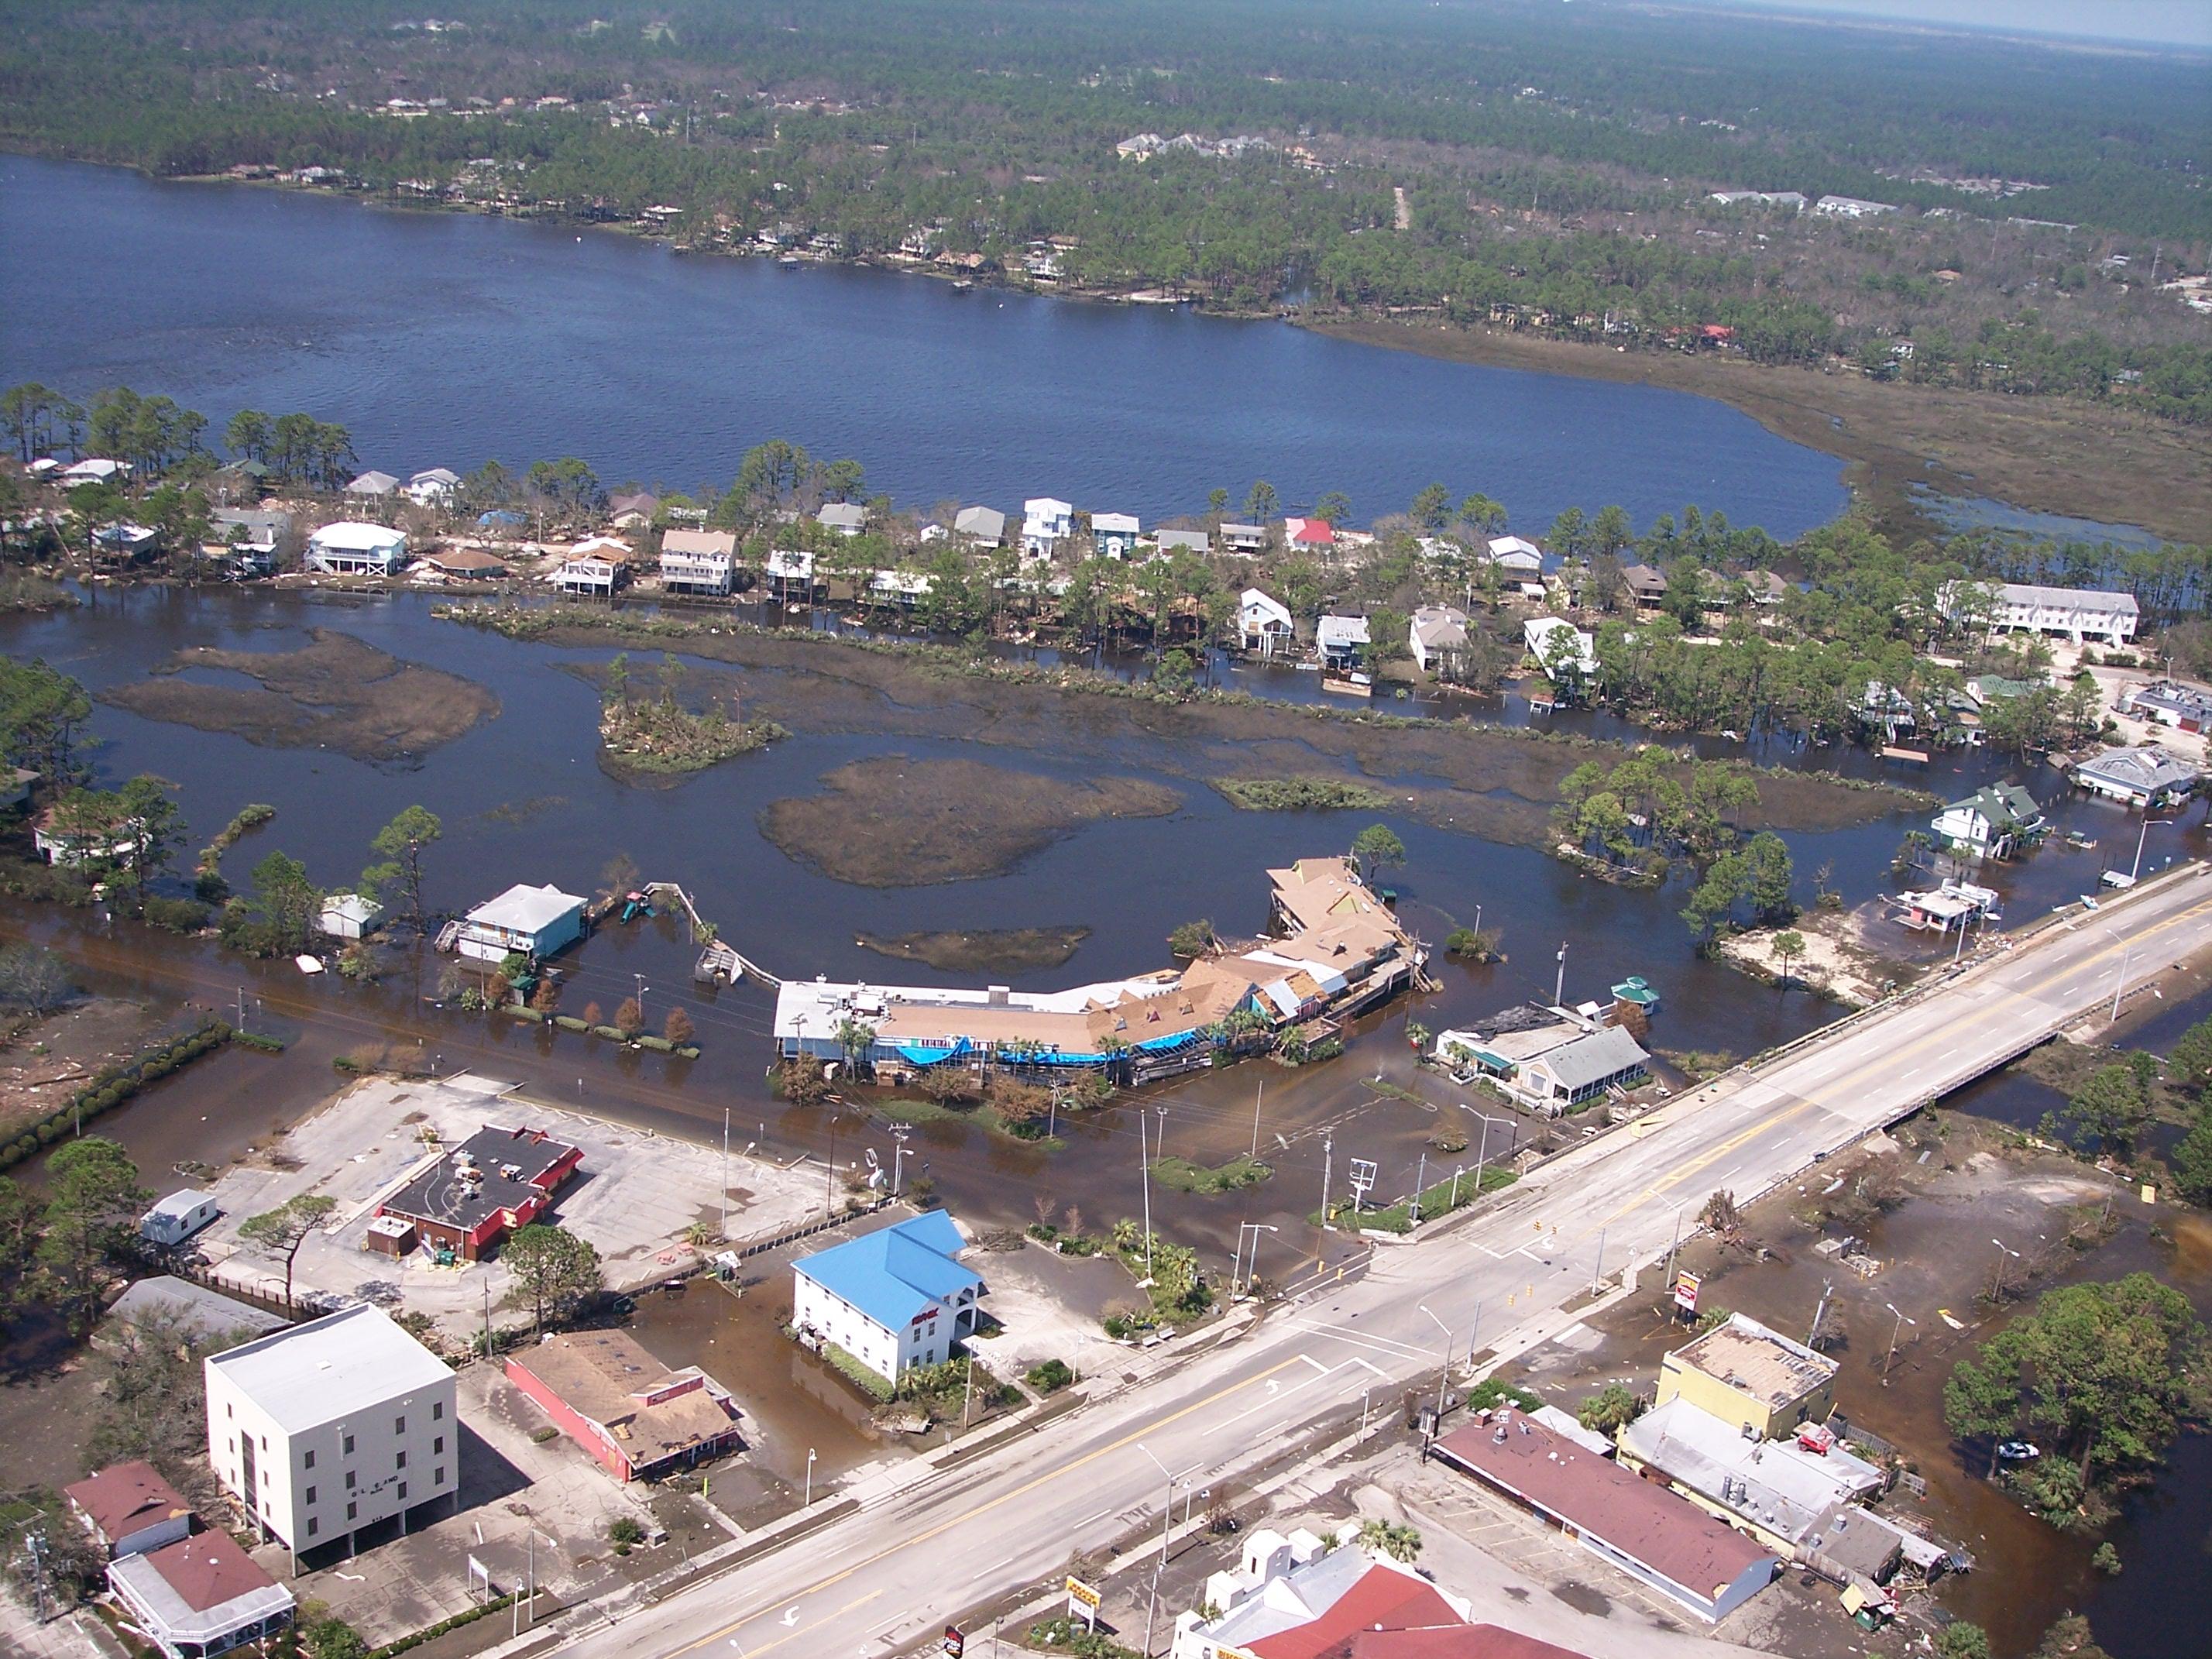 hurricane Ivan damage aerial view